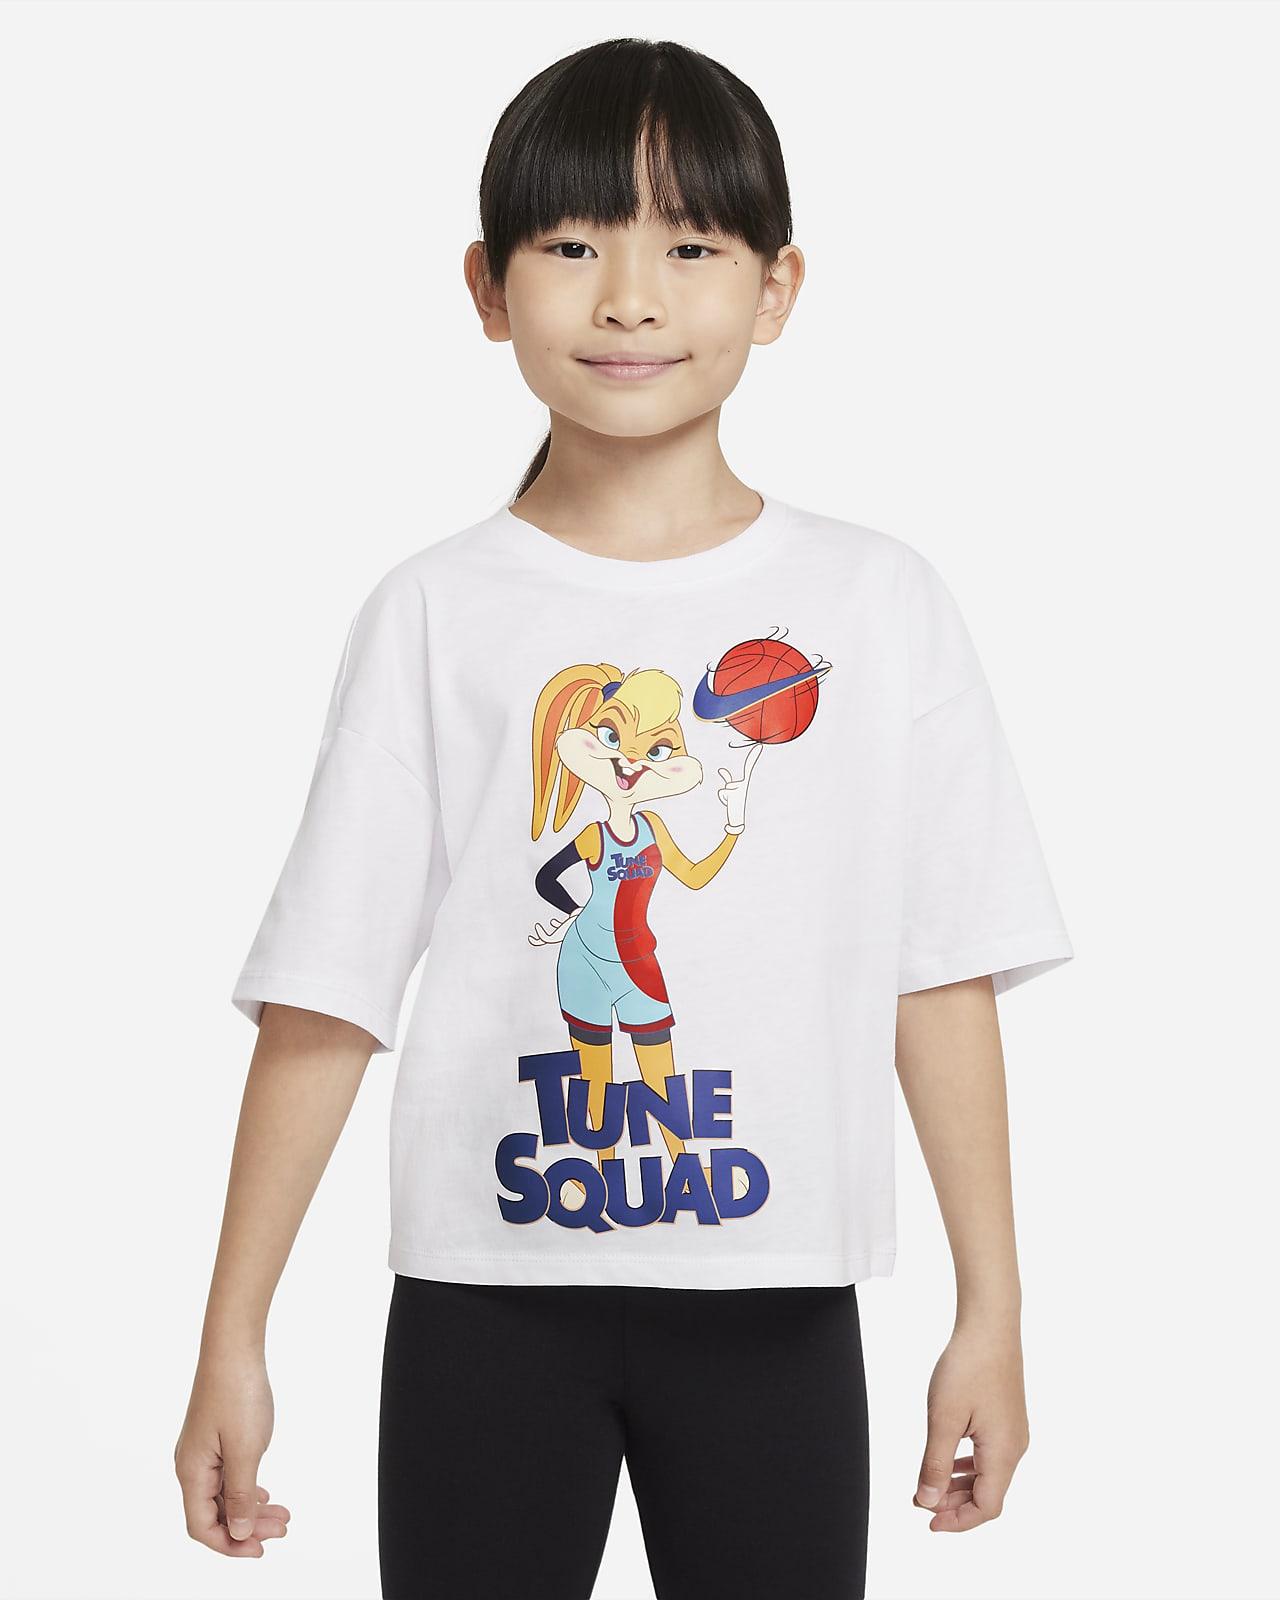 Nike Camiseta - Niño/a pequeño/a